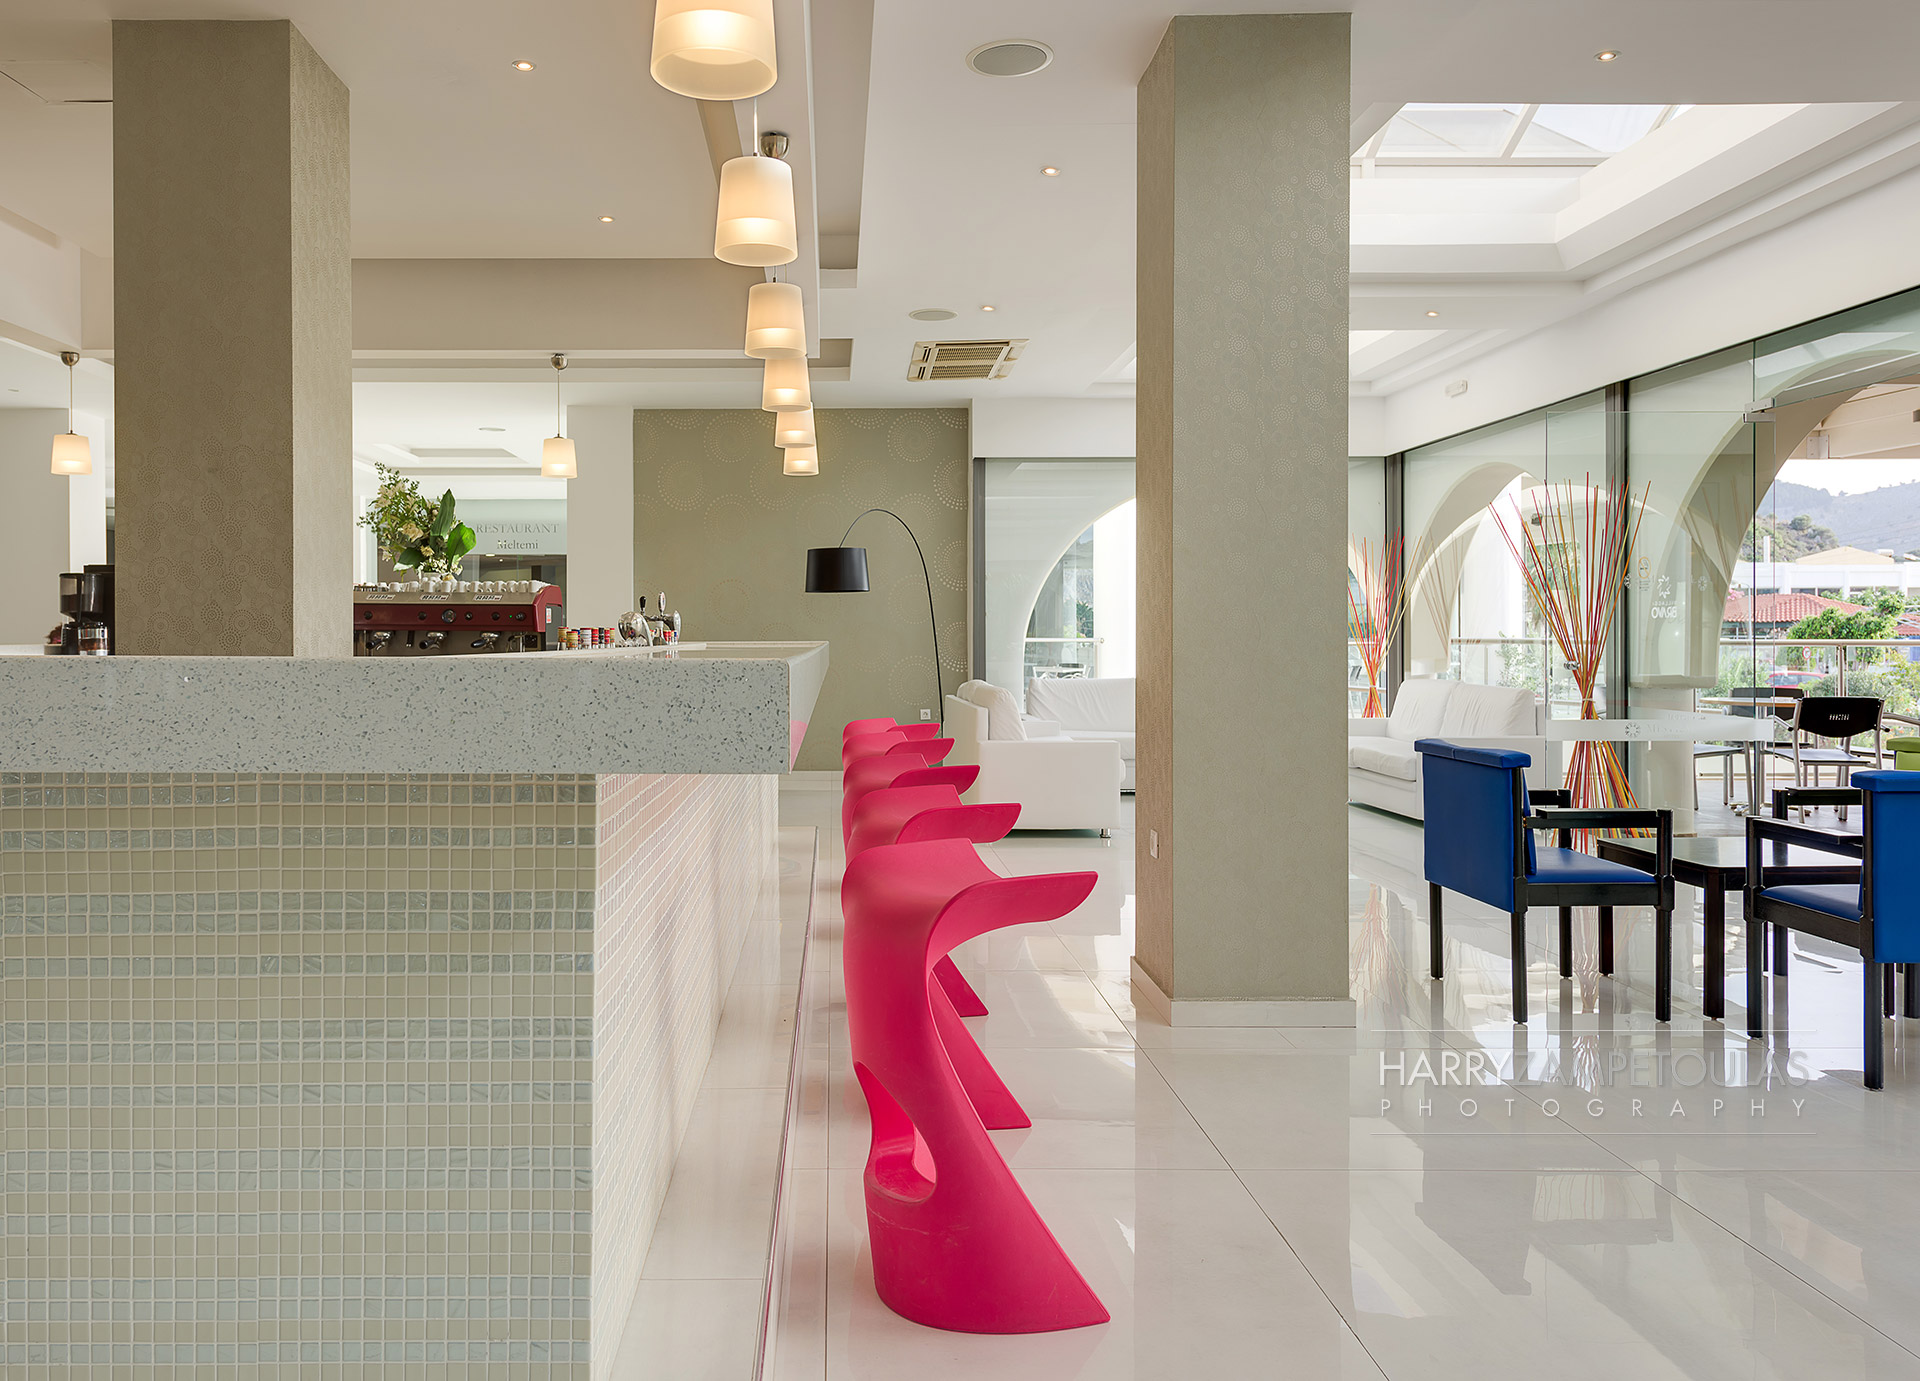 Mistral Hotel, Kolymbia, Rhodes – Hotel Photography Harry Zampetoulas